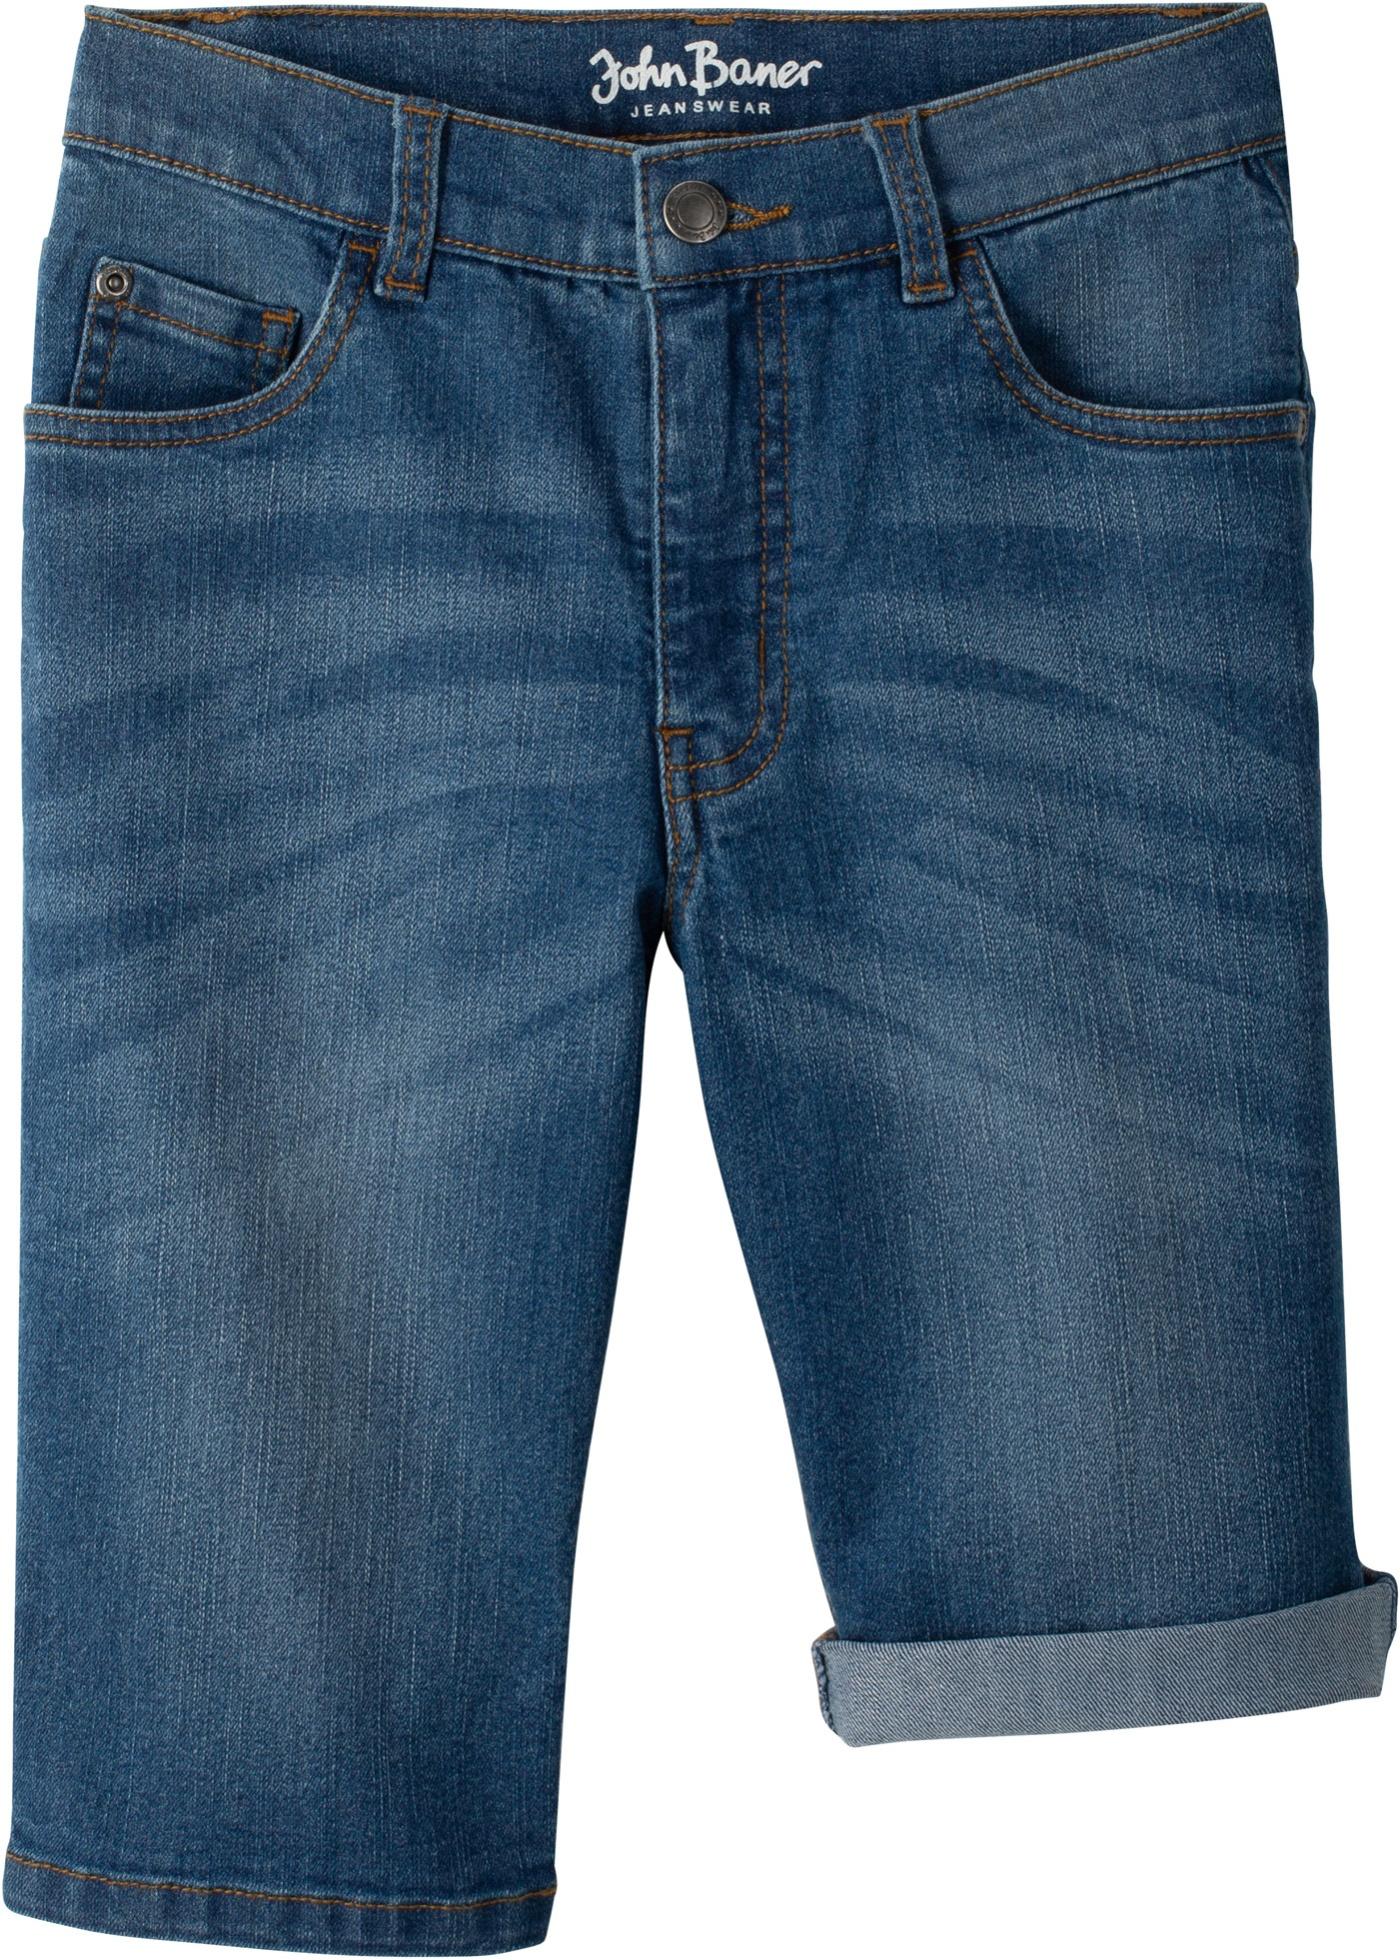 Bermuda di jeans (Blu) - John Baner JEANSWEAR